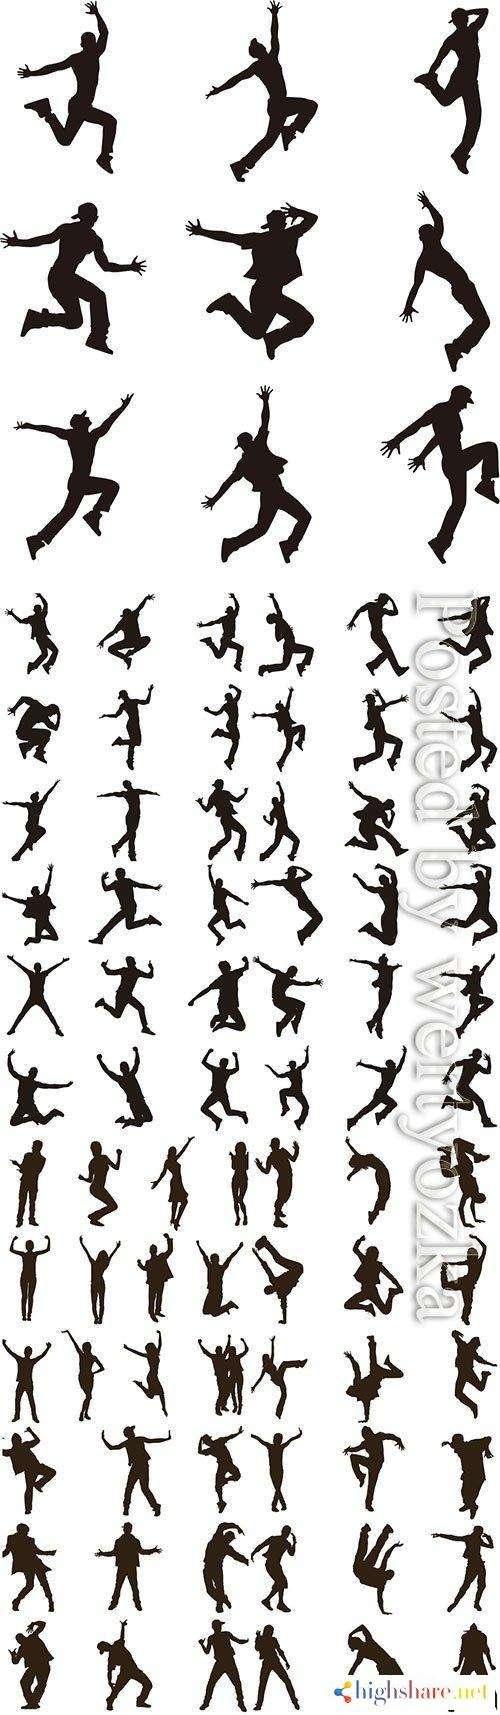 happy people vector silhouettes 5f4229e5a513d - Happy people vector silhouettes